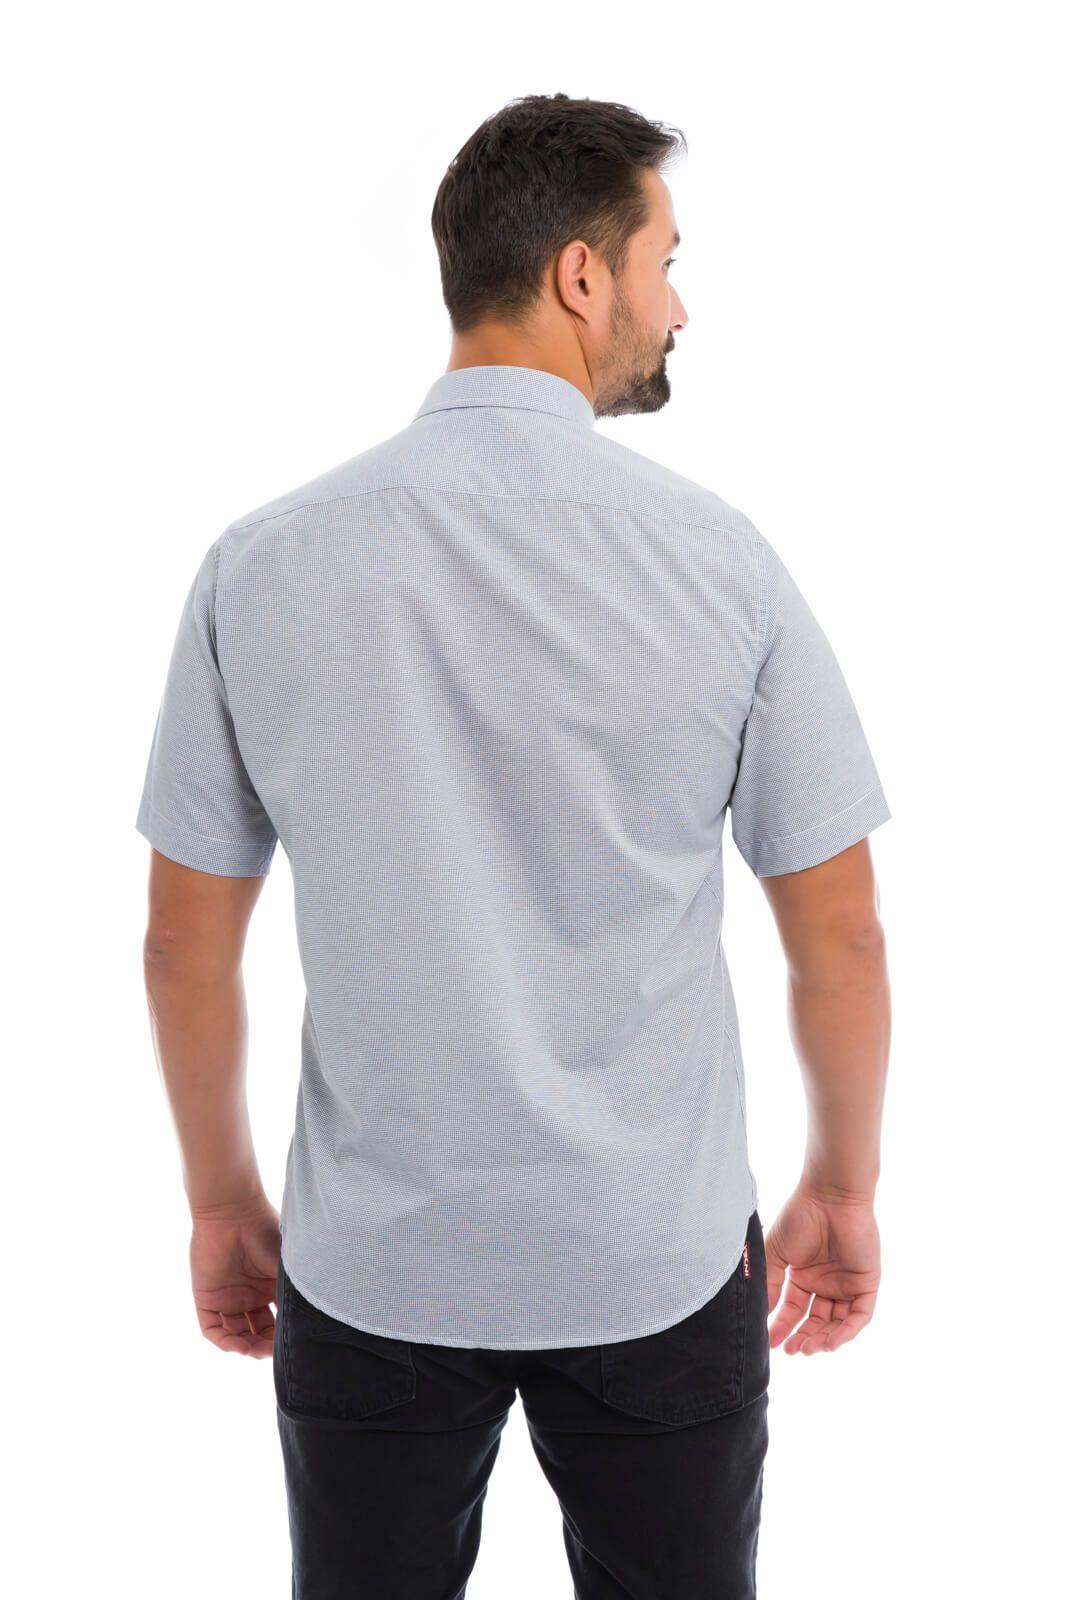 Camisa Social Masculina Slim Olimpo Xadrez Manga Curta